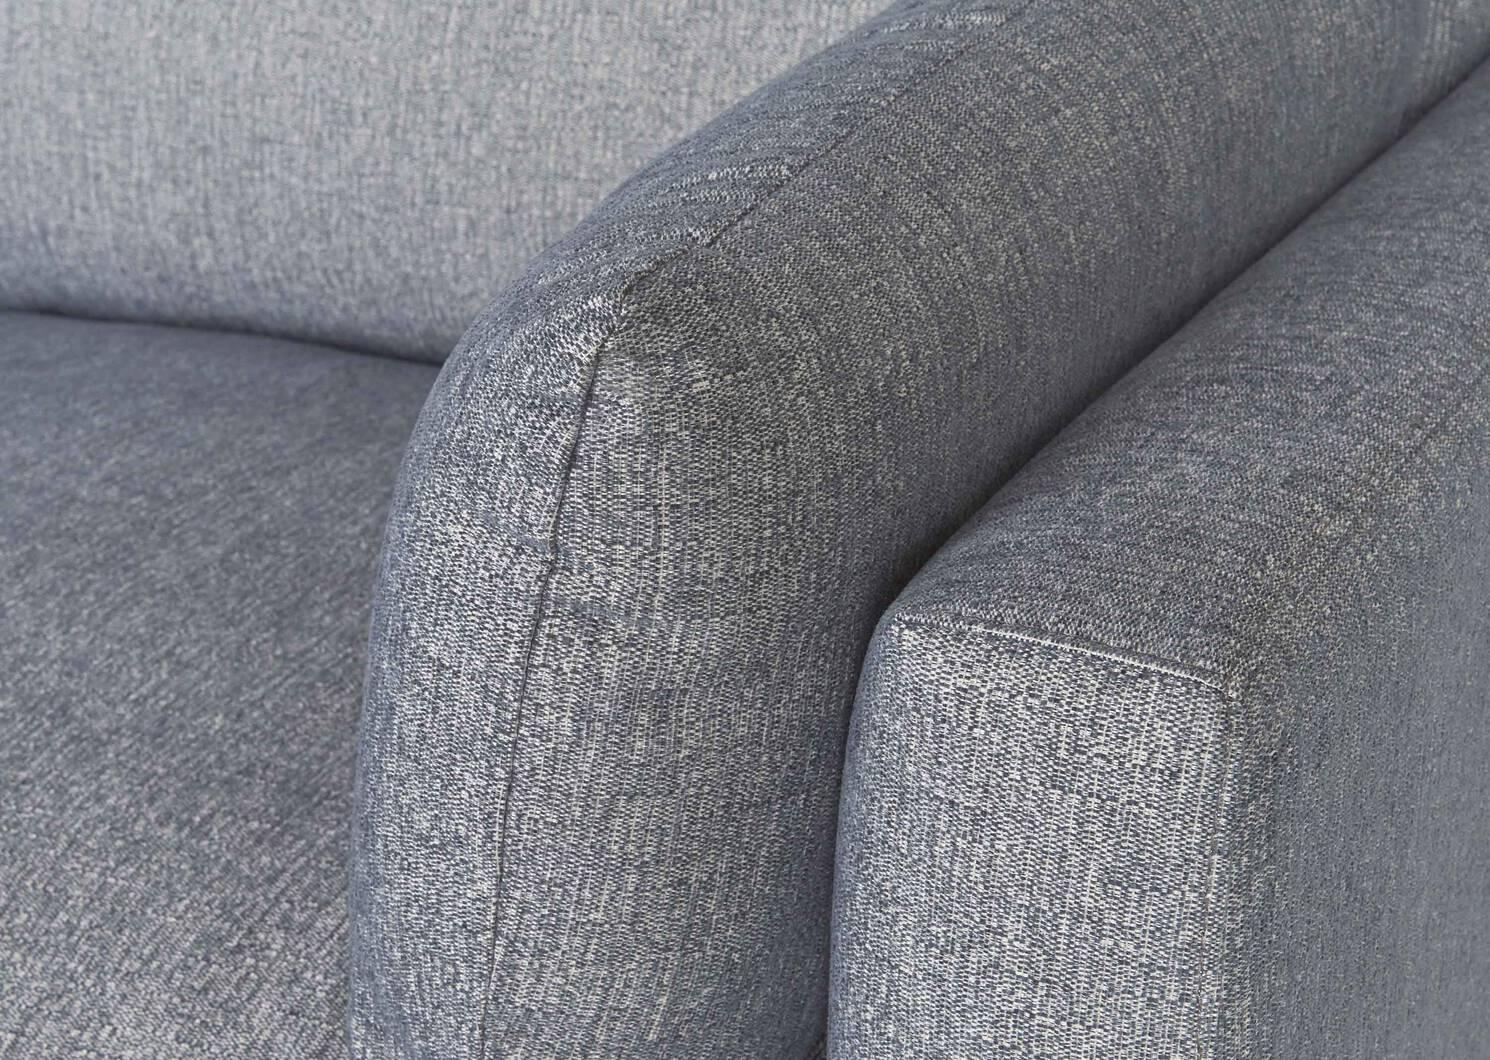 Ryerson Sofa Chaise -Rogen Pacific